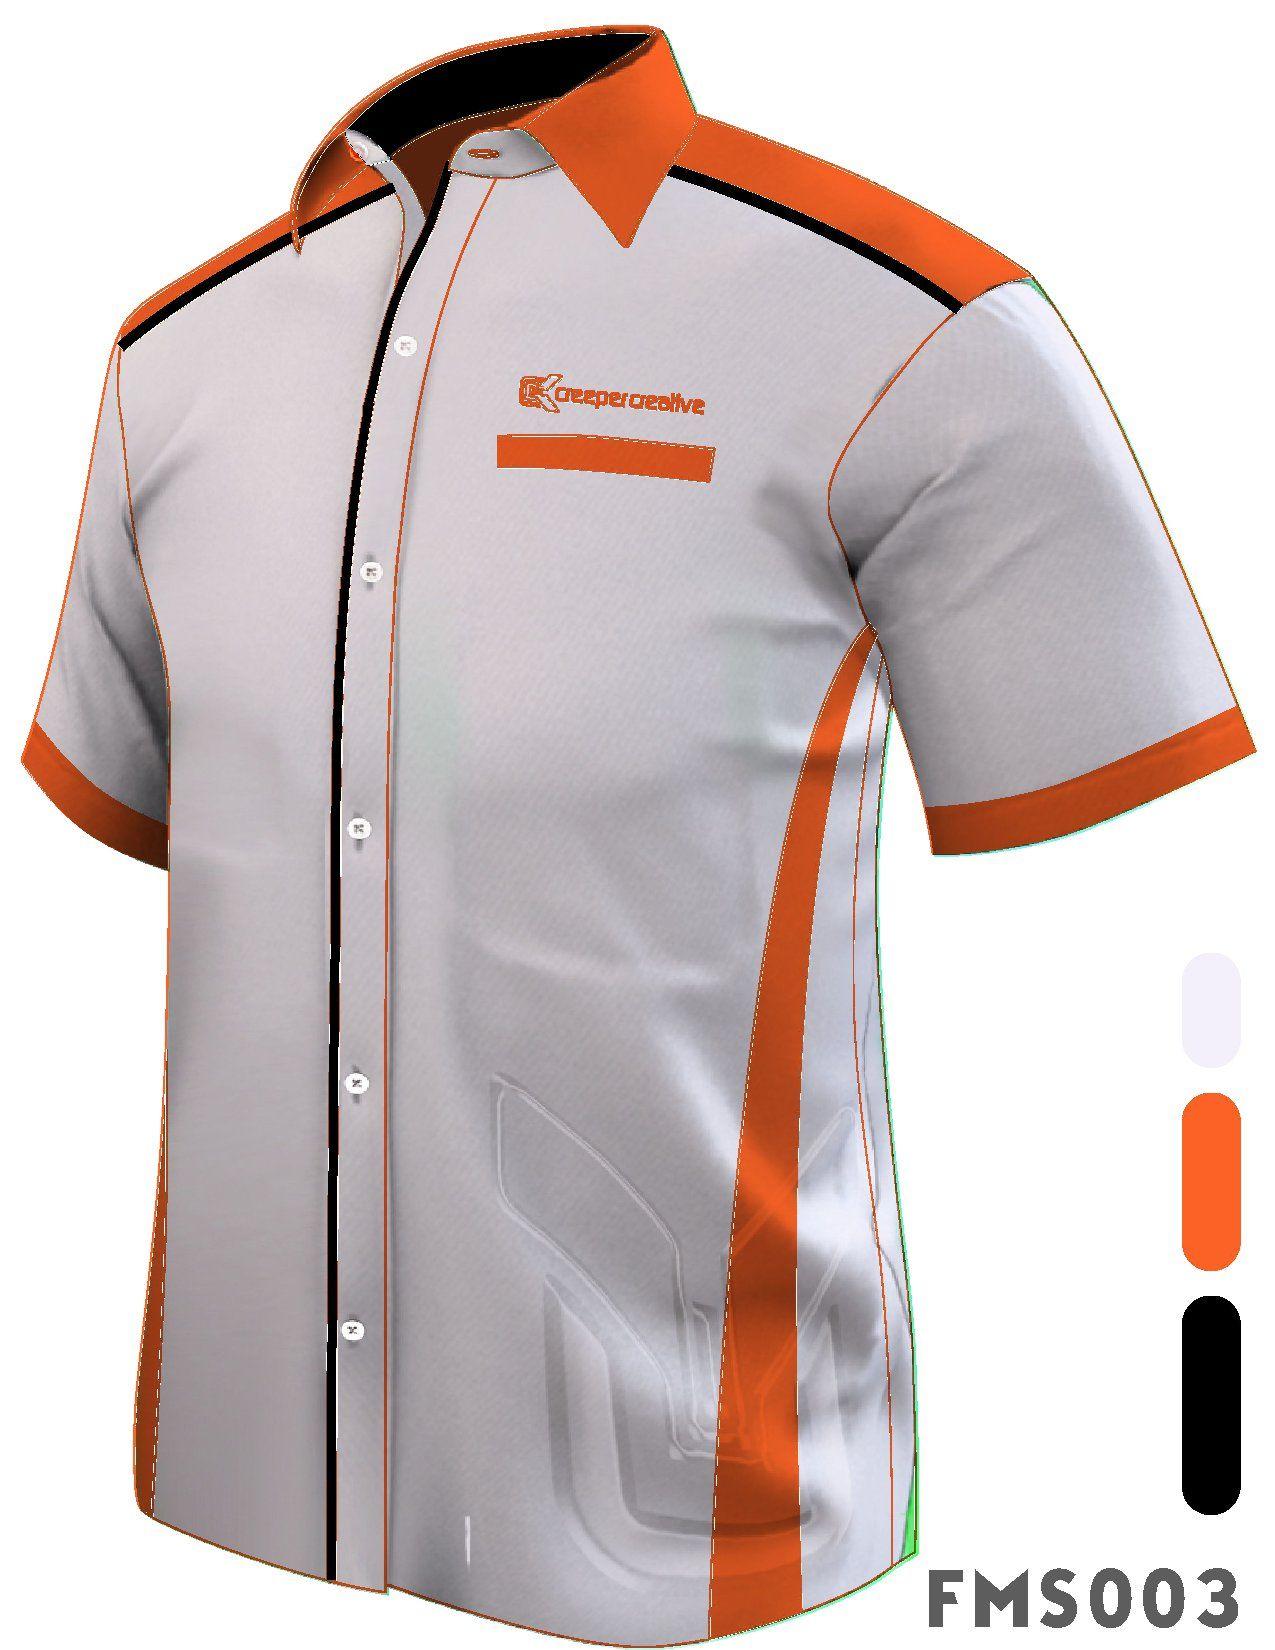 Embroidered Corporate Apparel & Company Uniforms. Design